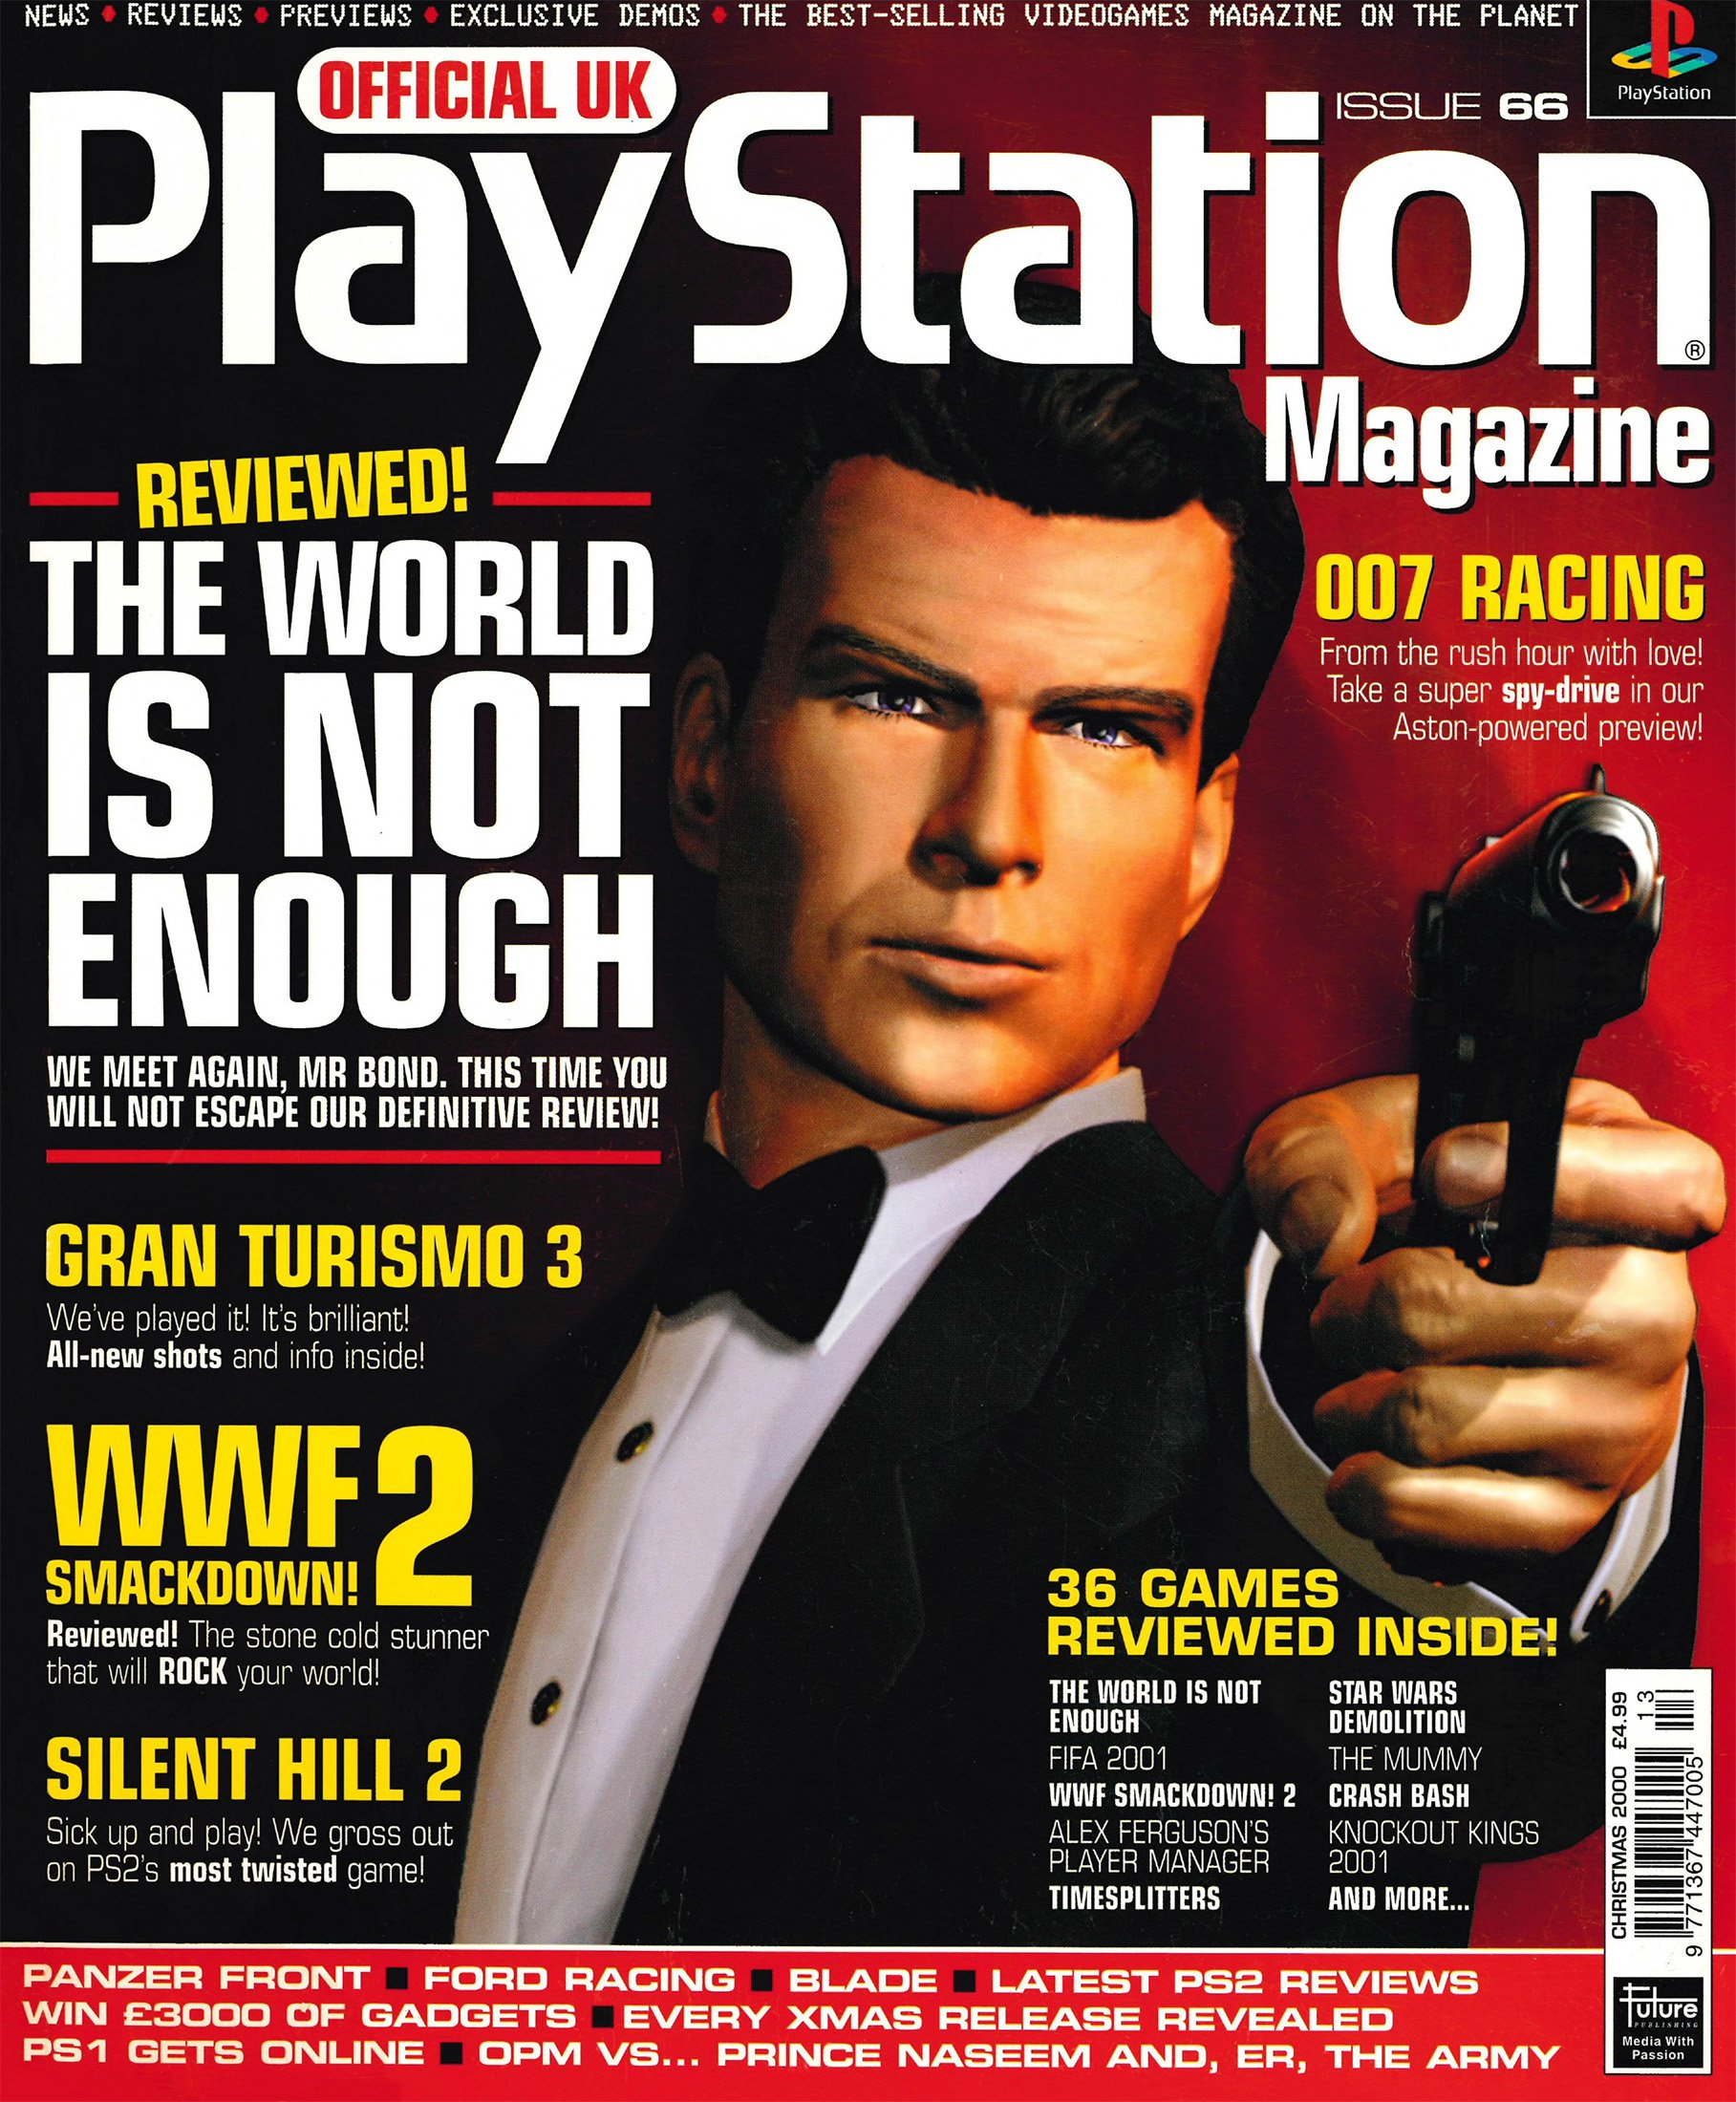 Official UK PlayStation Magazine Issue 066 (Xmas 2000)